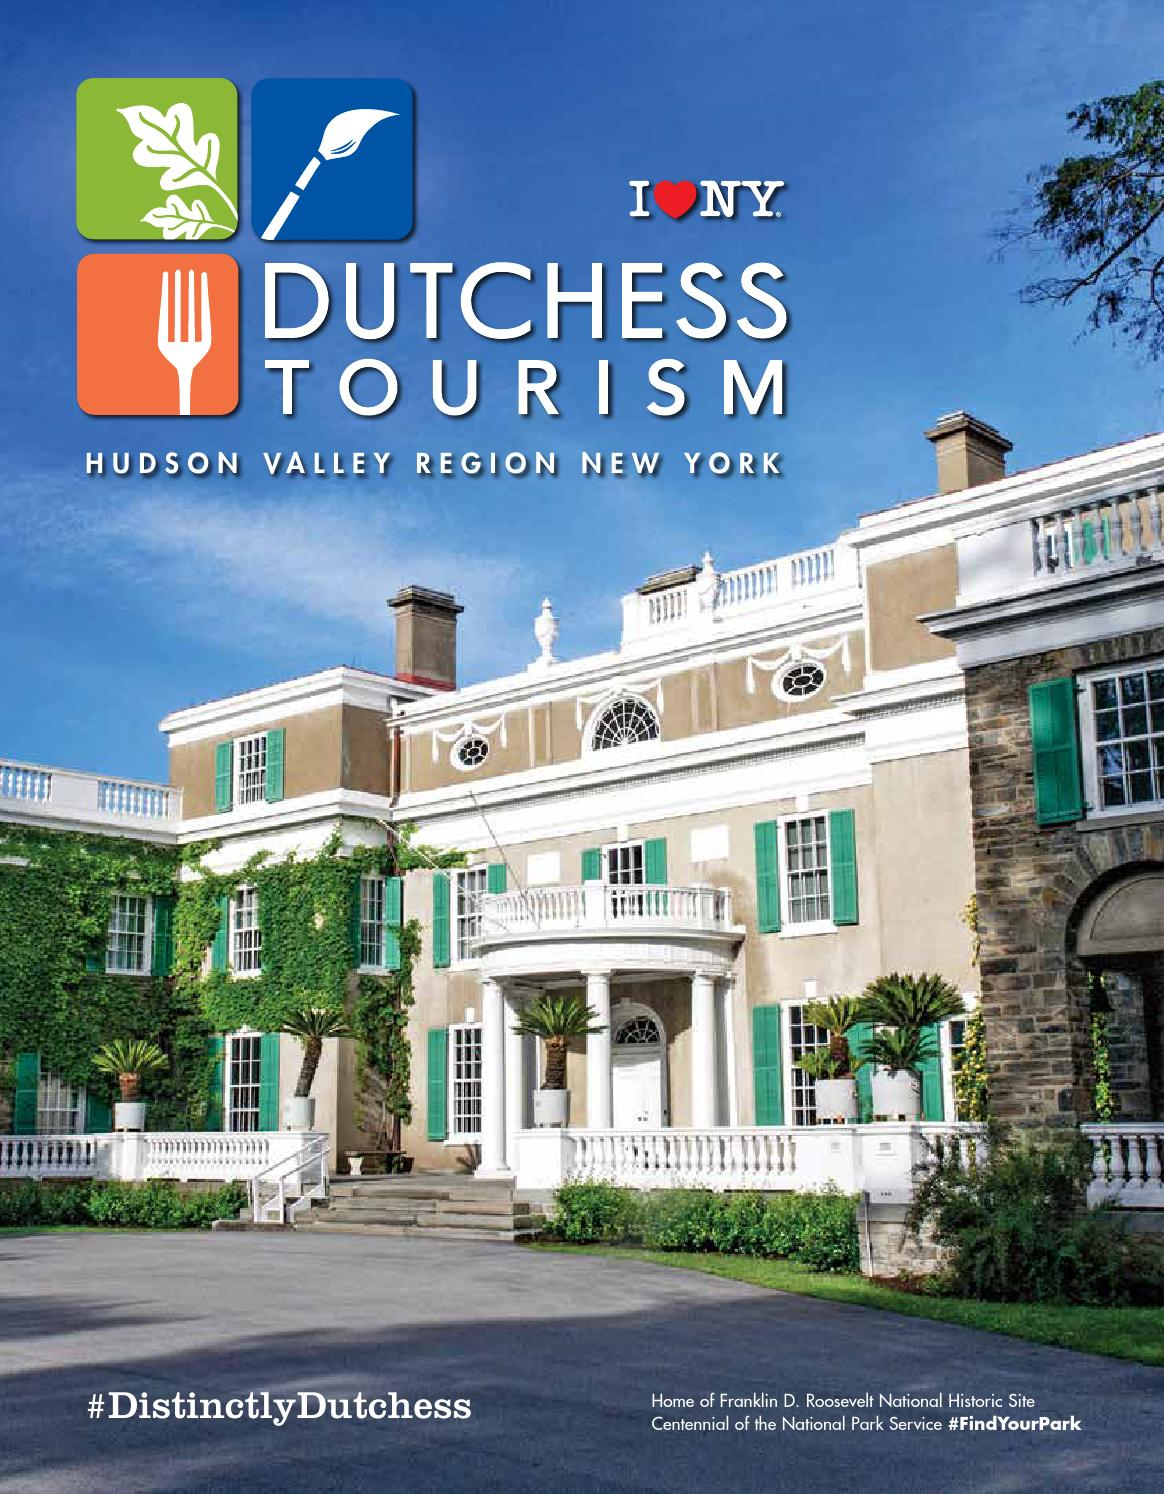 2016 Dutchess Tourism Guide by Luminary Media - issuu